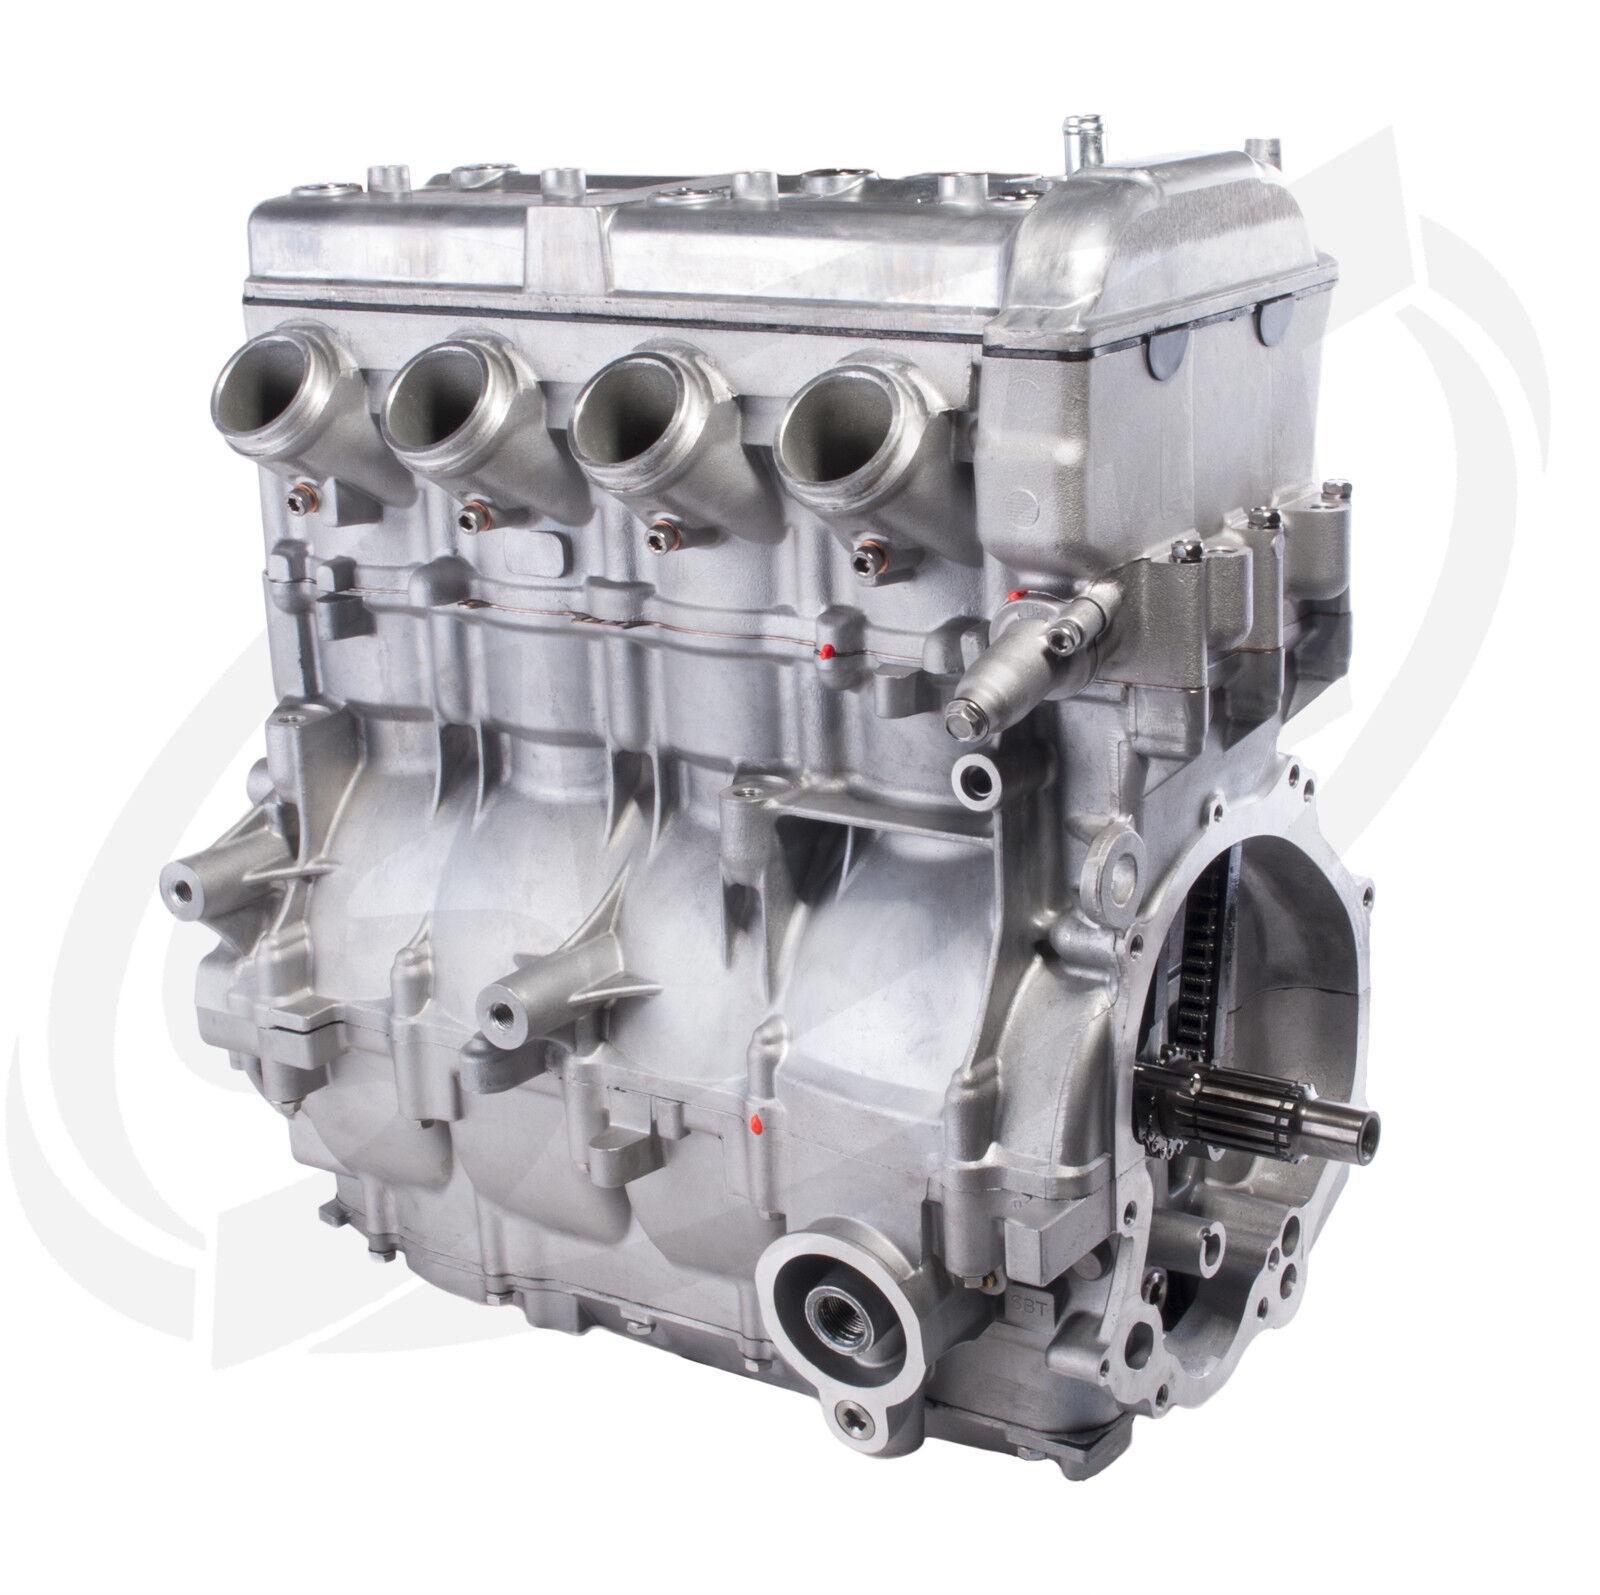 Yamaha Motor 2004 Fx 140 1100 Waverunner Cruiser 140 Fx Ho Babyhaar Welt Sbt 29-411 077359